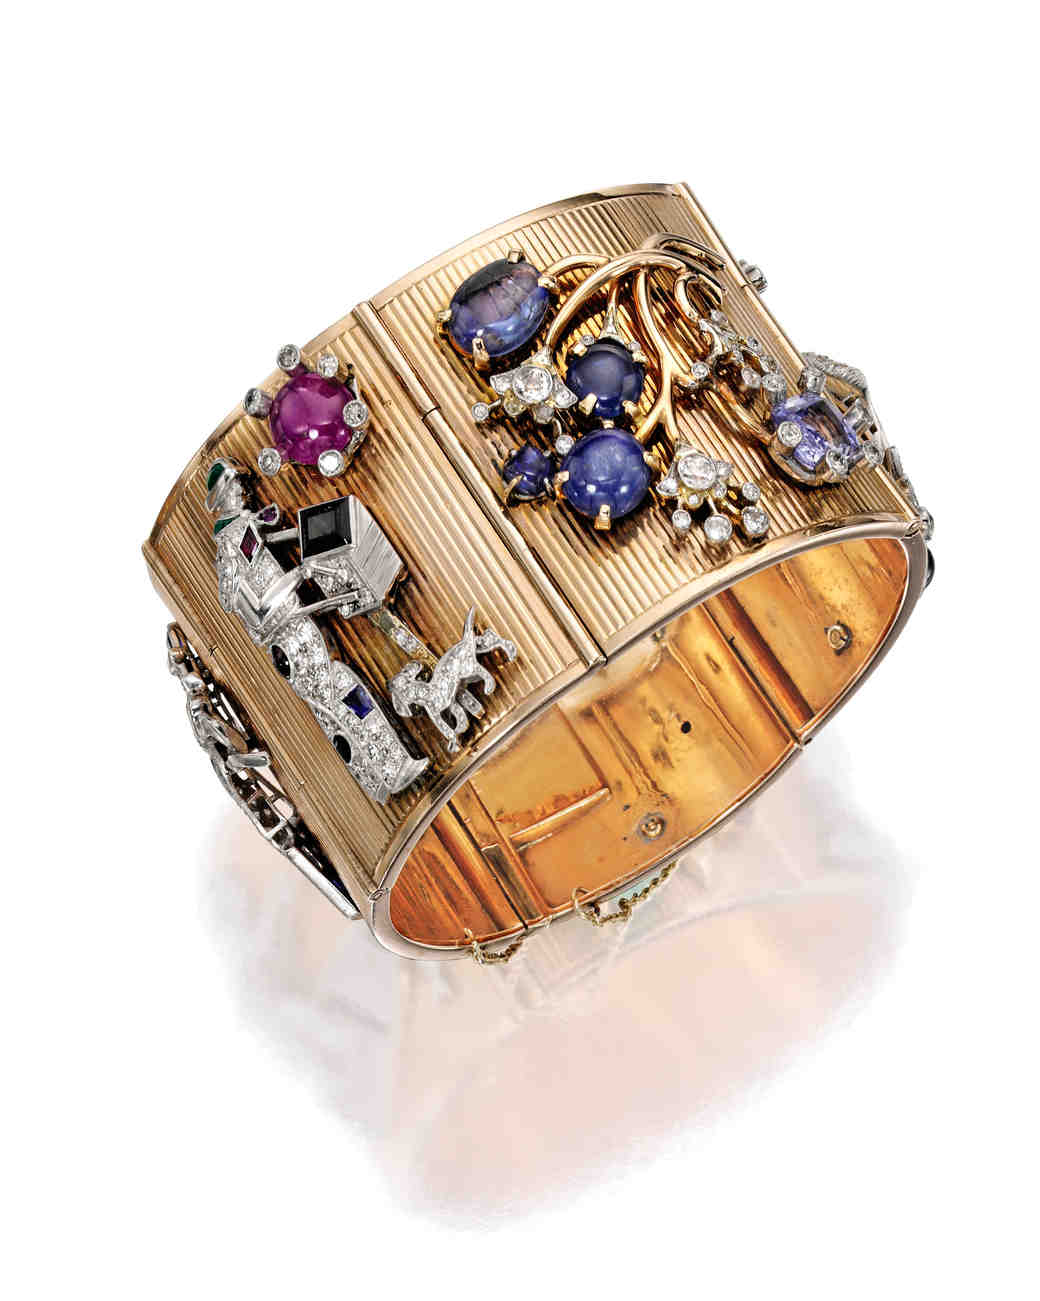 sothebys-ebay-auction-9331-lot-202-0415.jpg